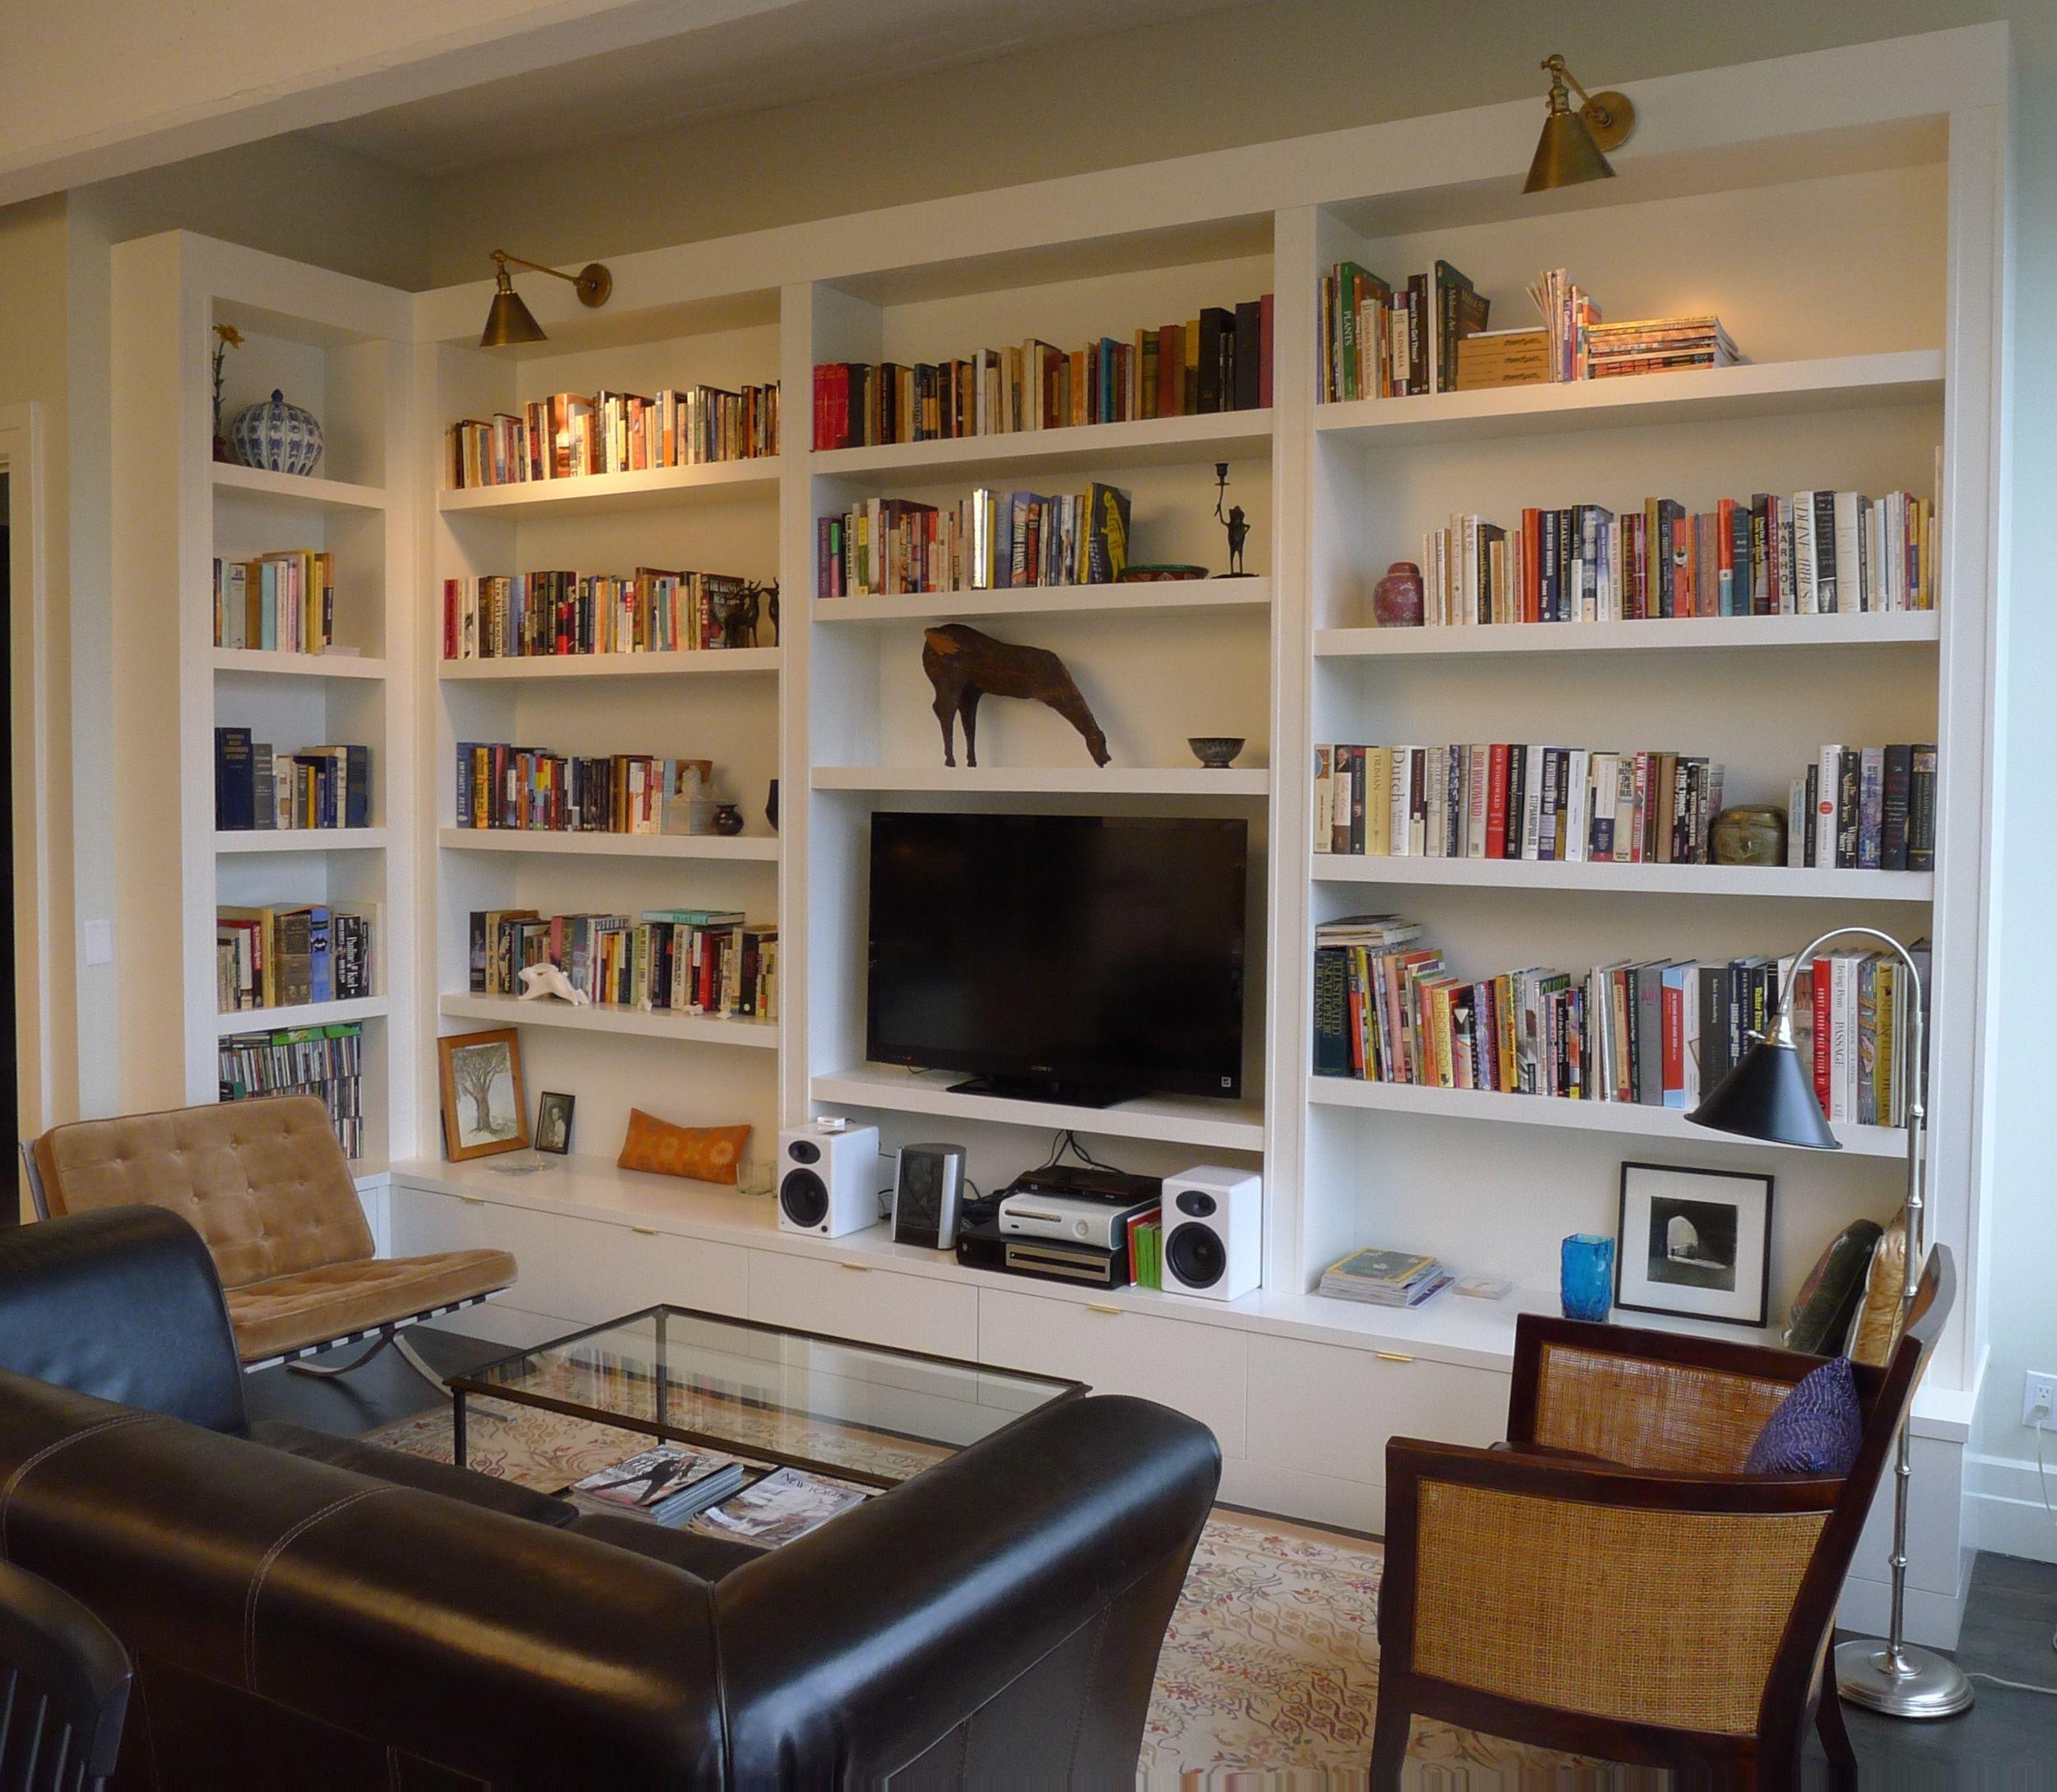 Pin by rachael on bookshelves | Pinterest | Bookcase ...